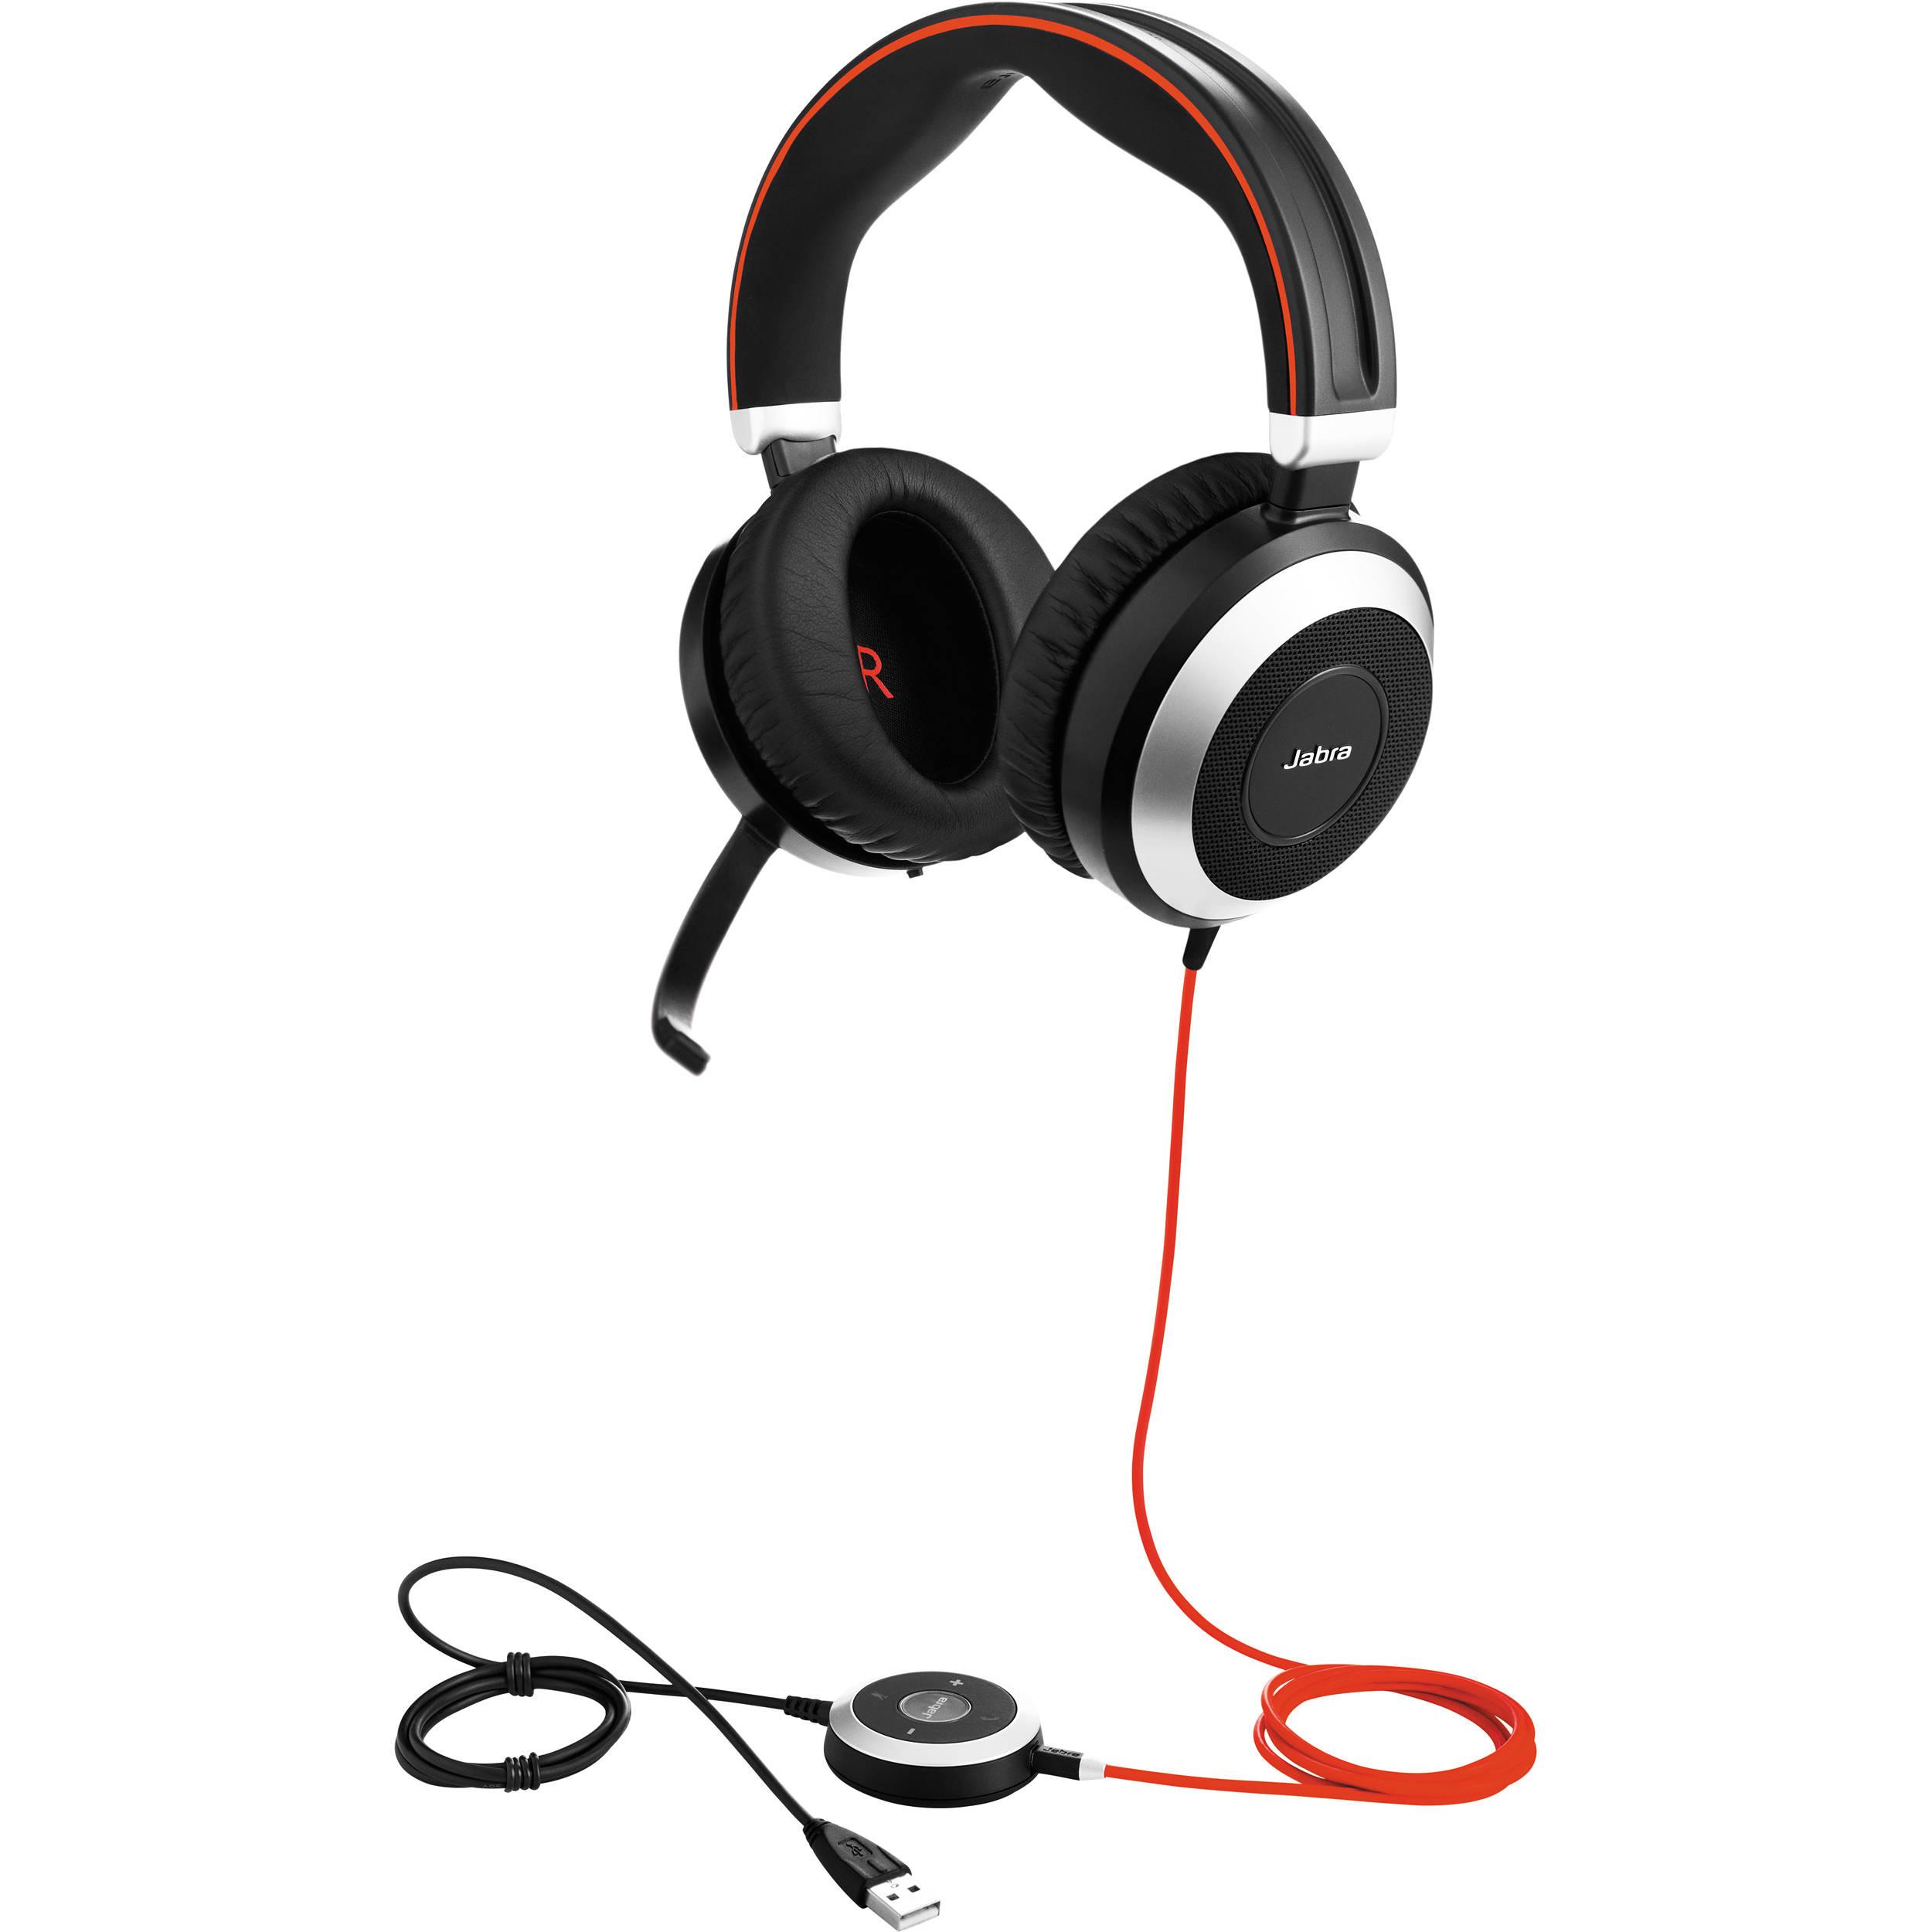 Jabra Evolve 80 Uc Stereo Headset 7899 829 209 B H Photo Video